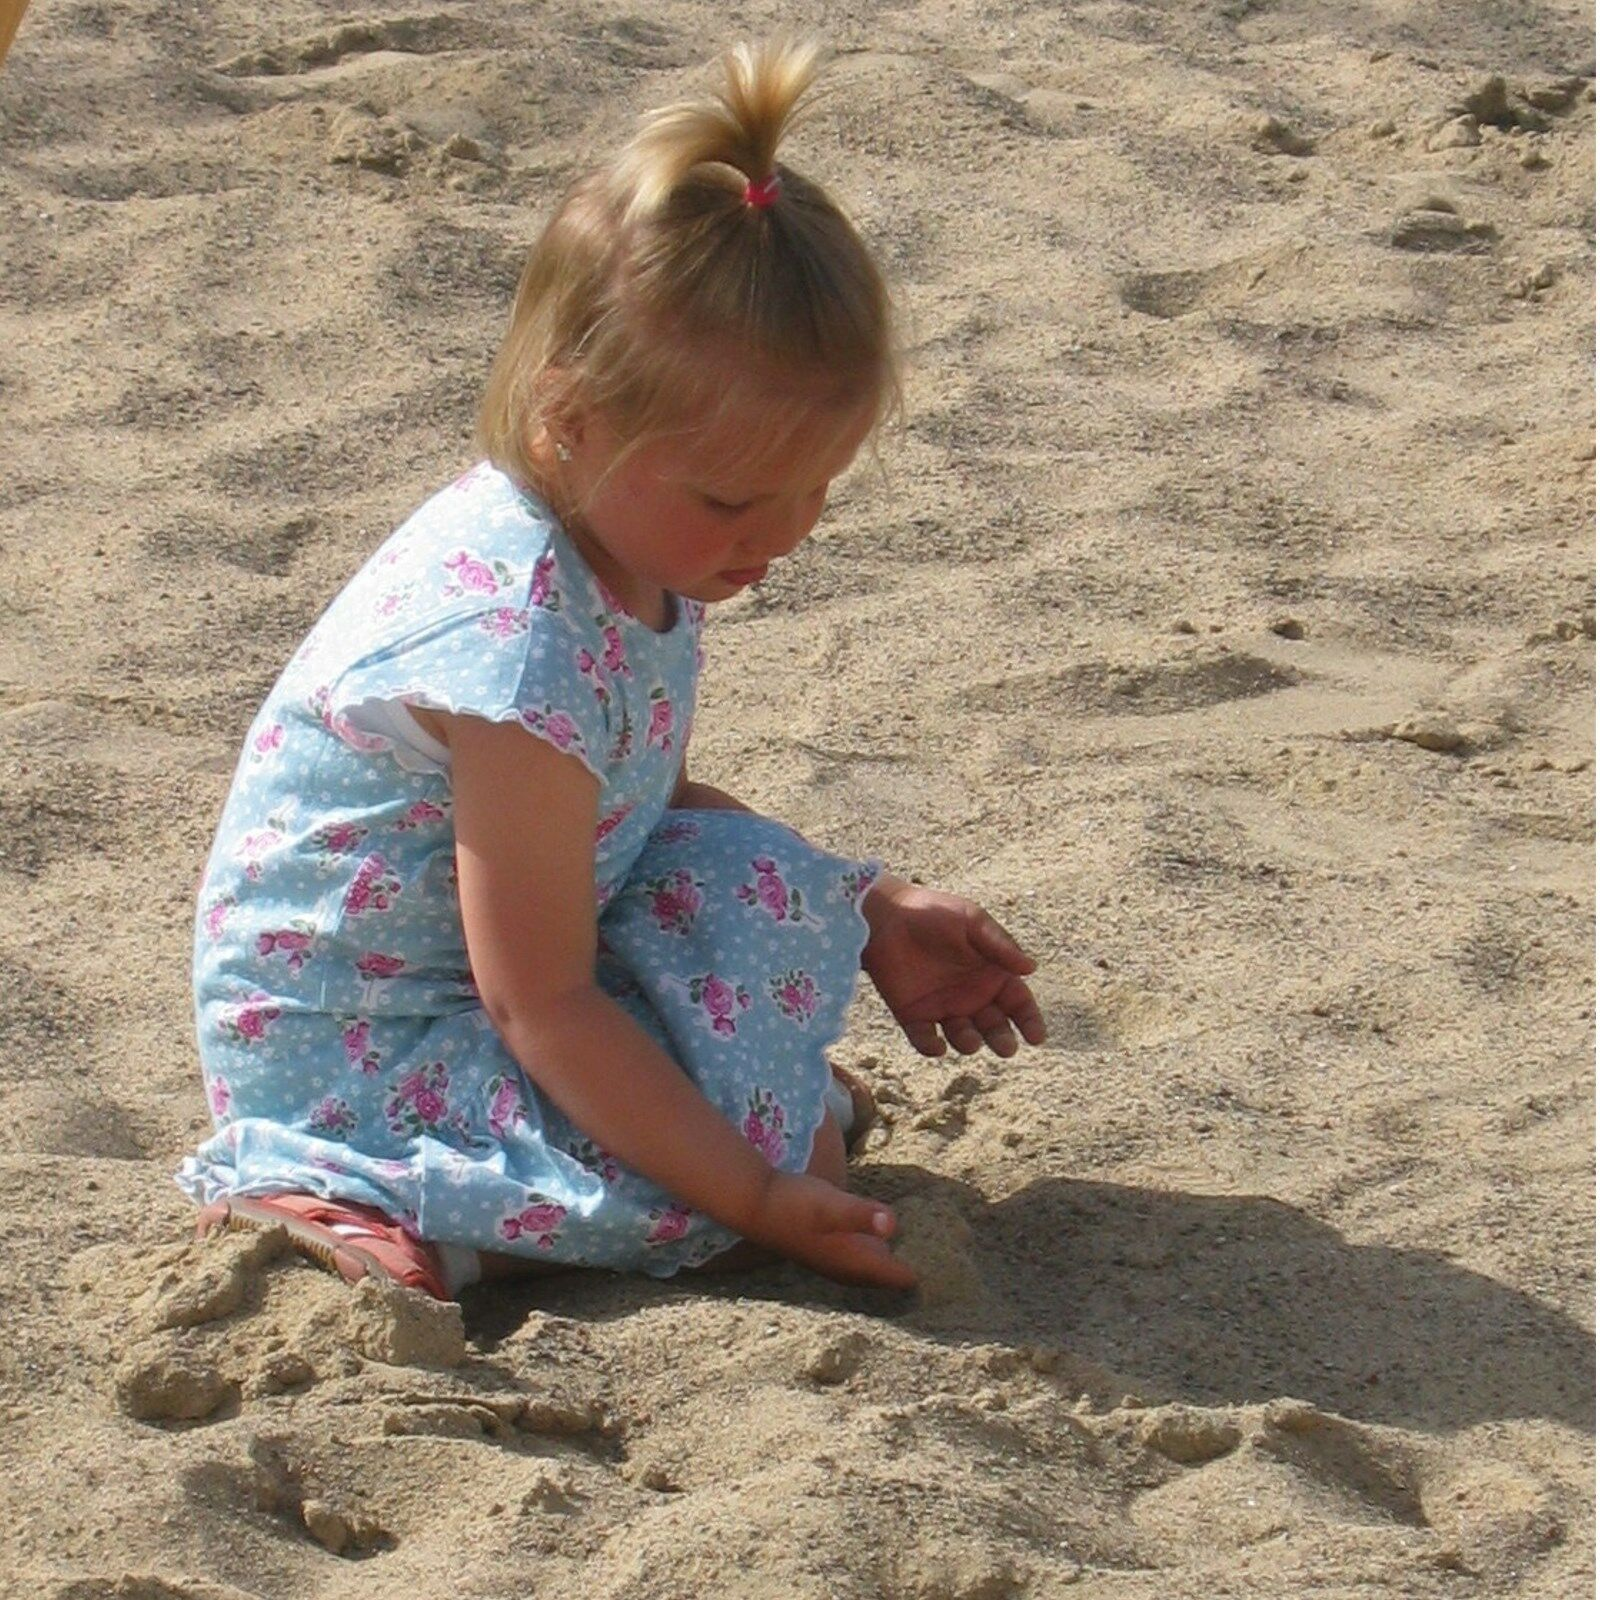 LoggyLand Sandkasten Sandkasten Sandkasten Spielsand 2 mm 200 kg geprüfte Qualitätsware Quarzsand Sand 911306